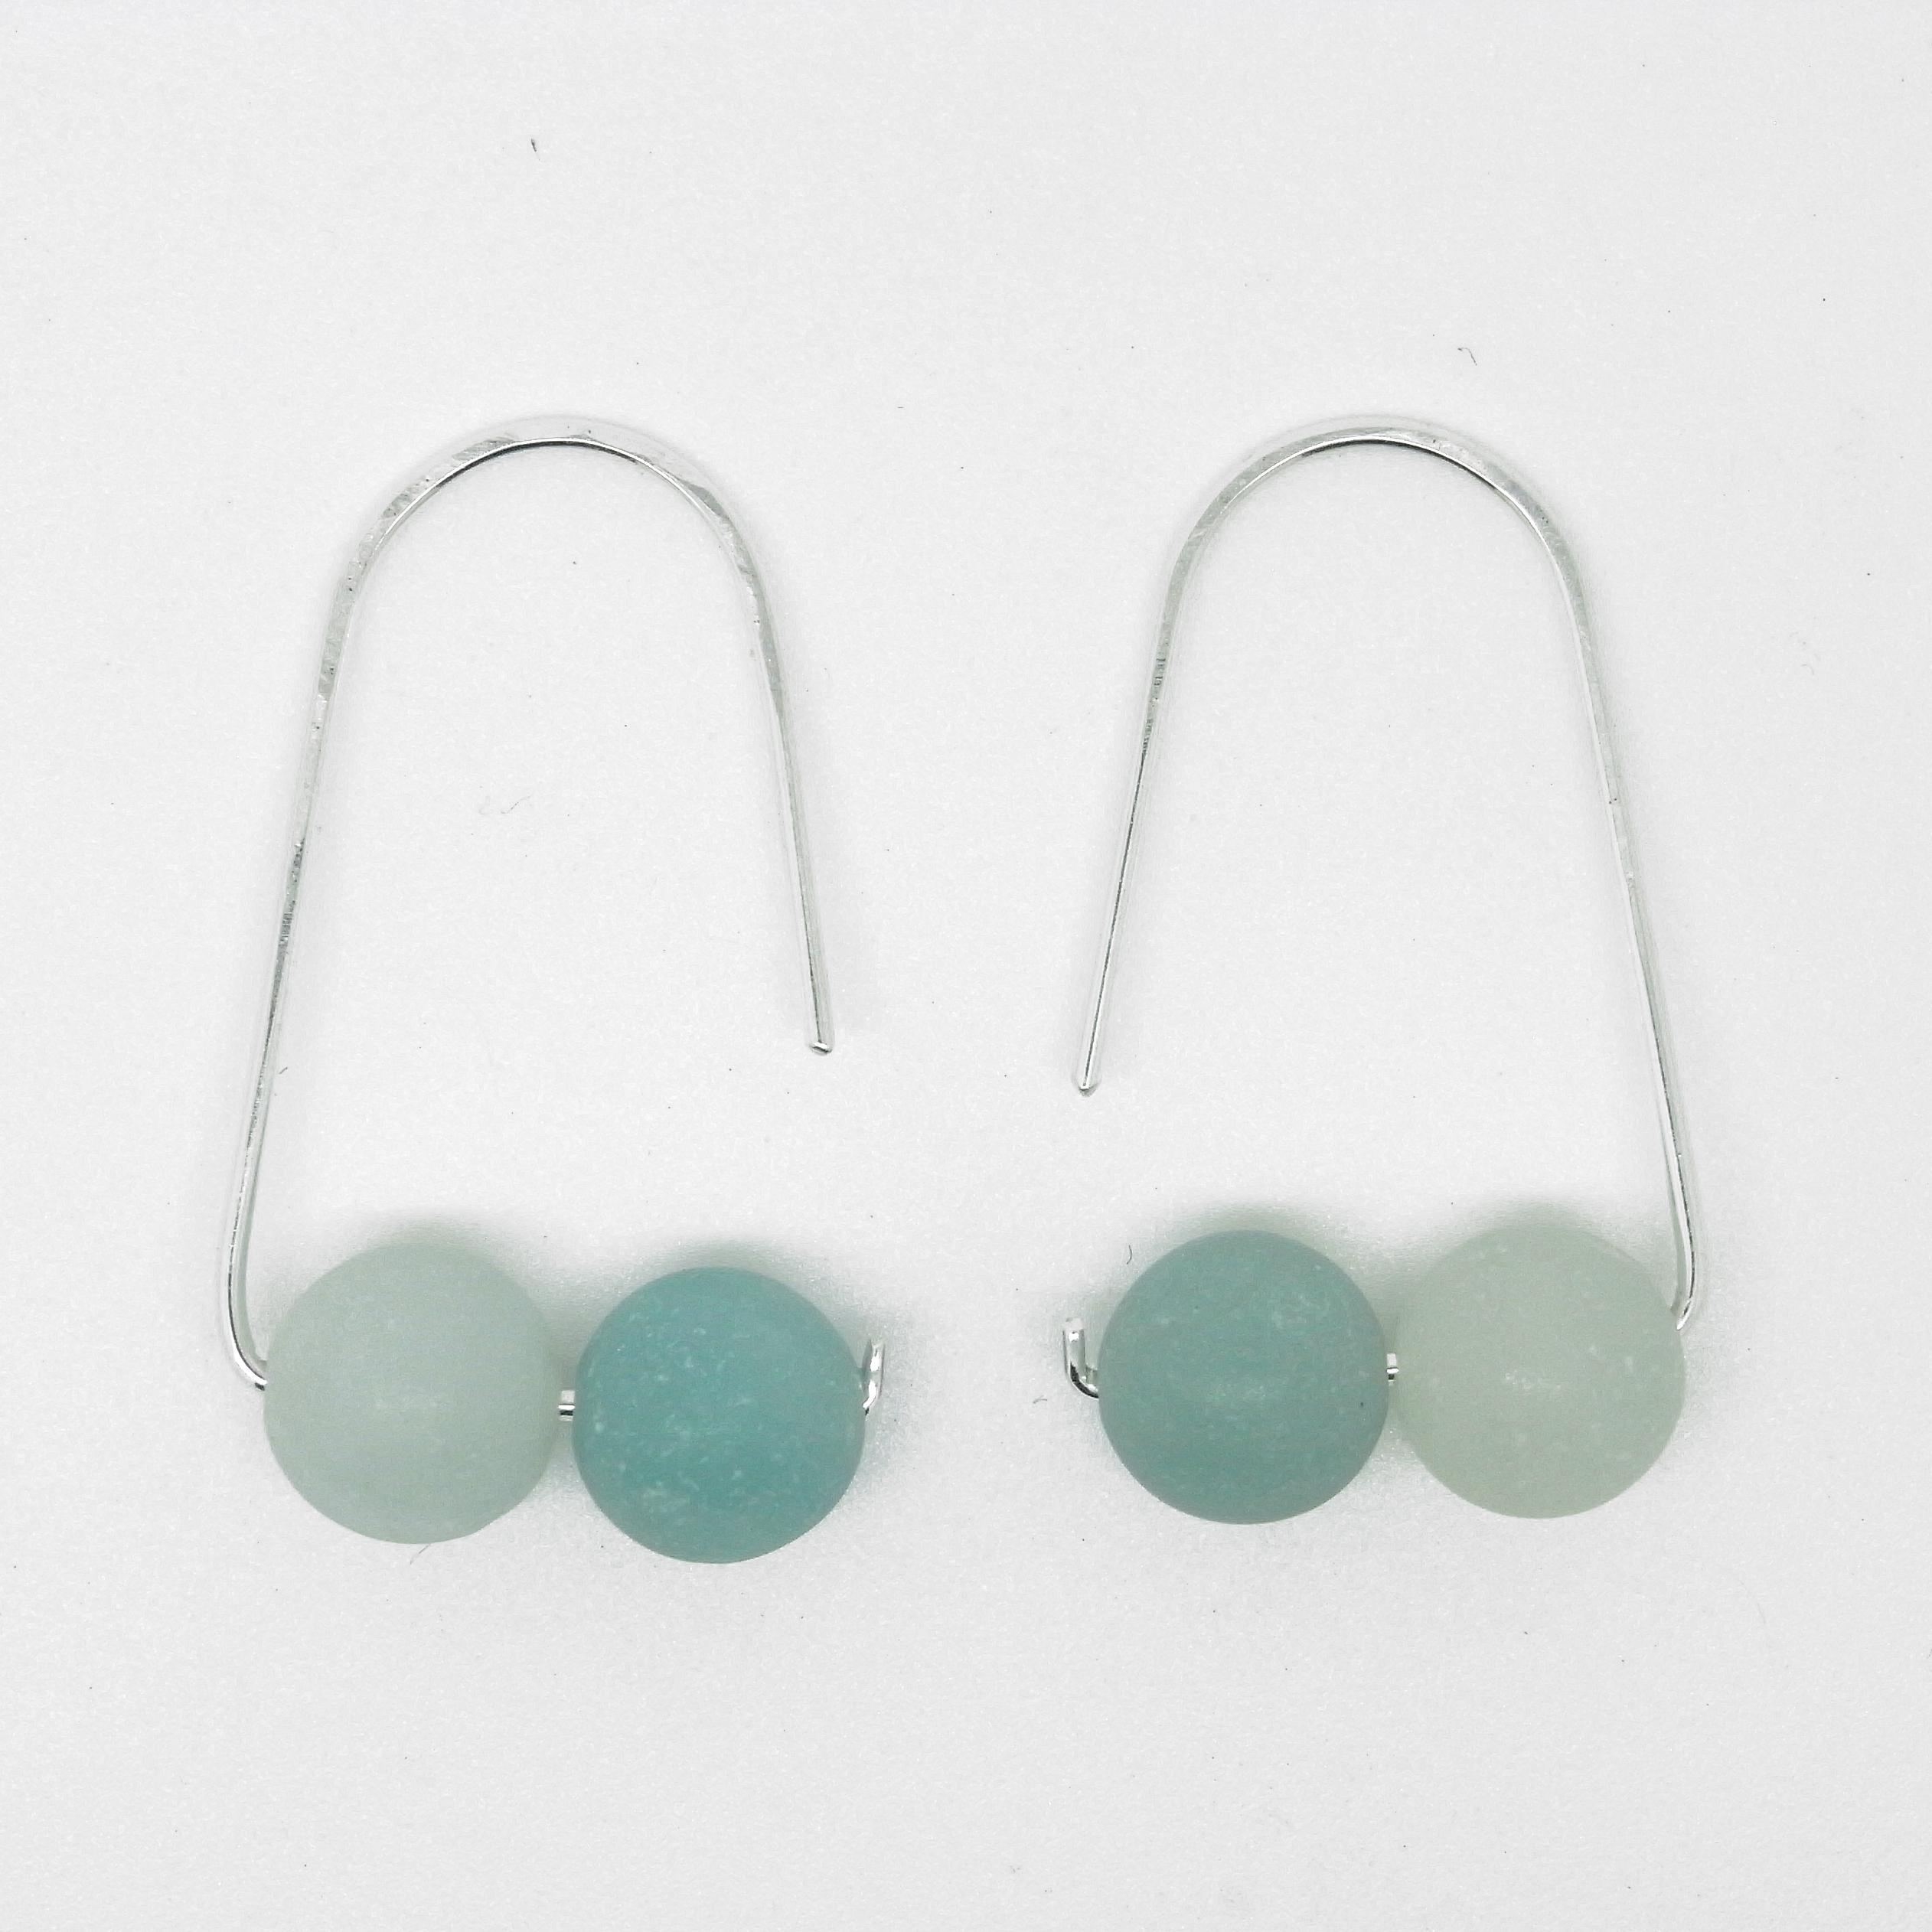 Amazonite Earrings 2